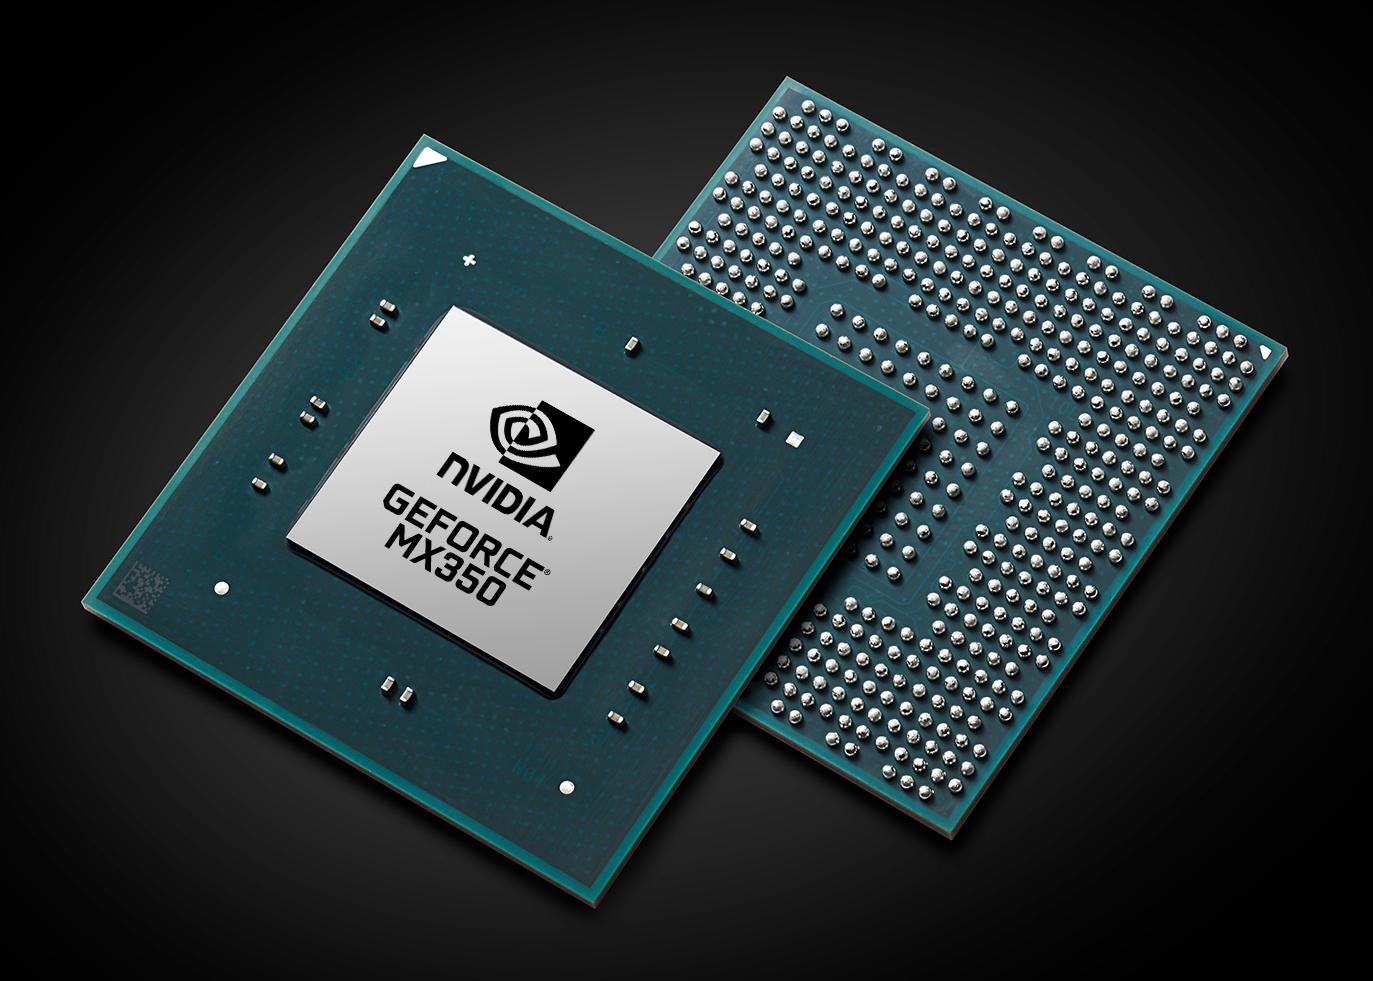 Nvidia Geforce Mx350 Laptop Graphics Card Notebookcheck Net Tech